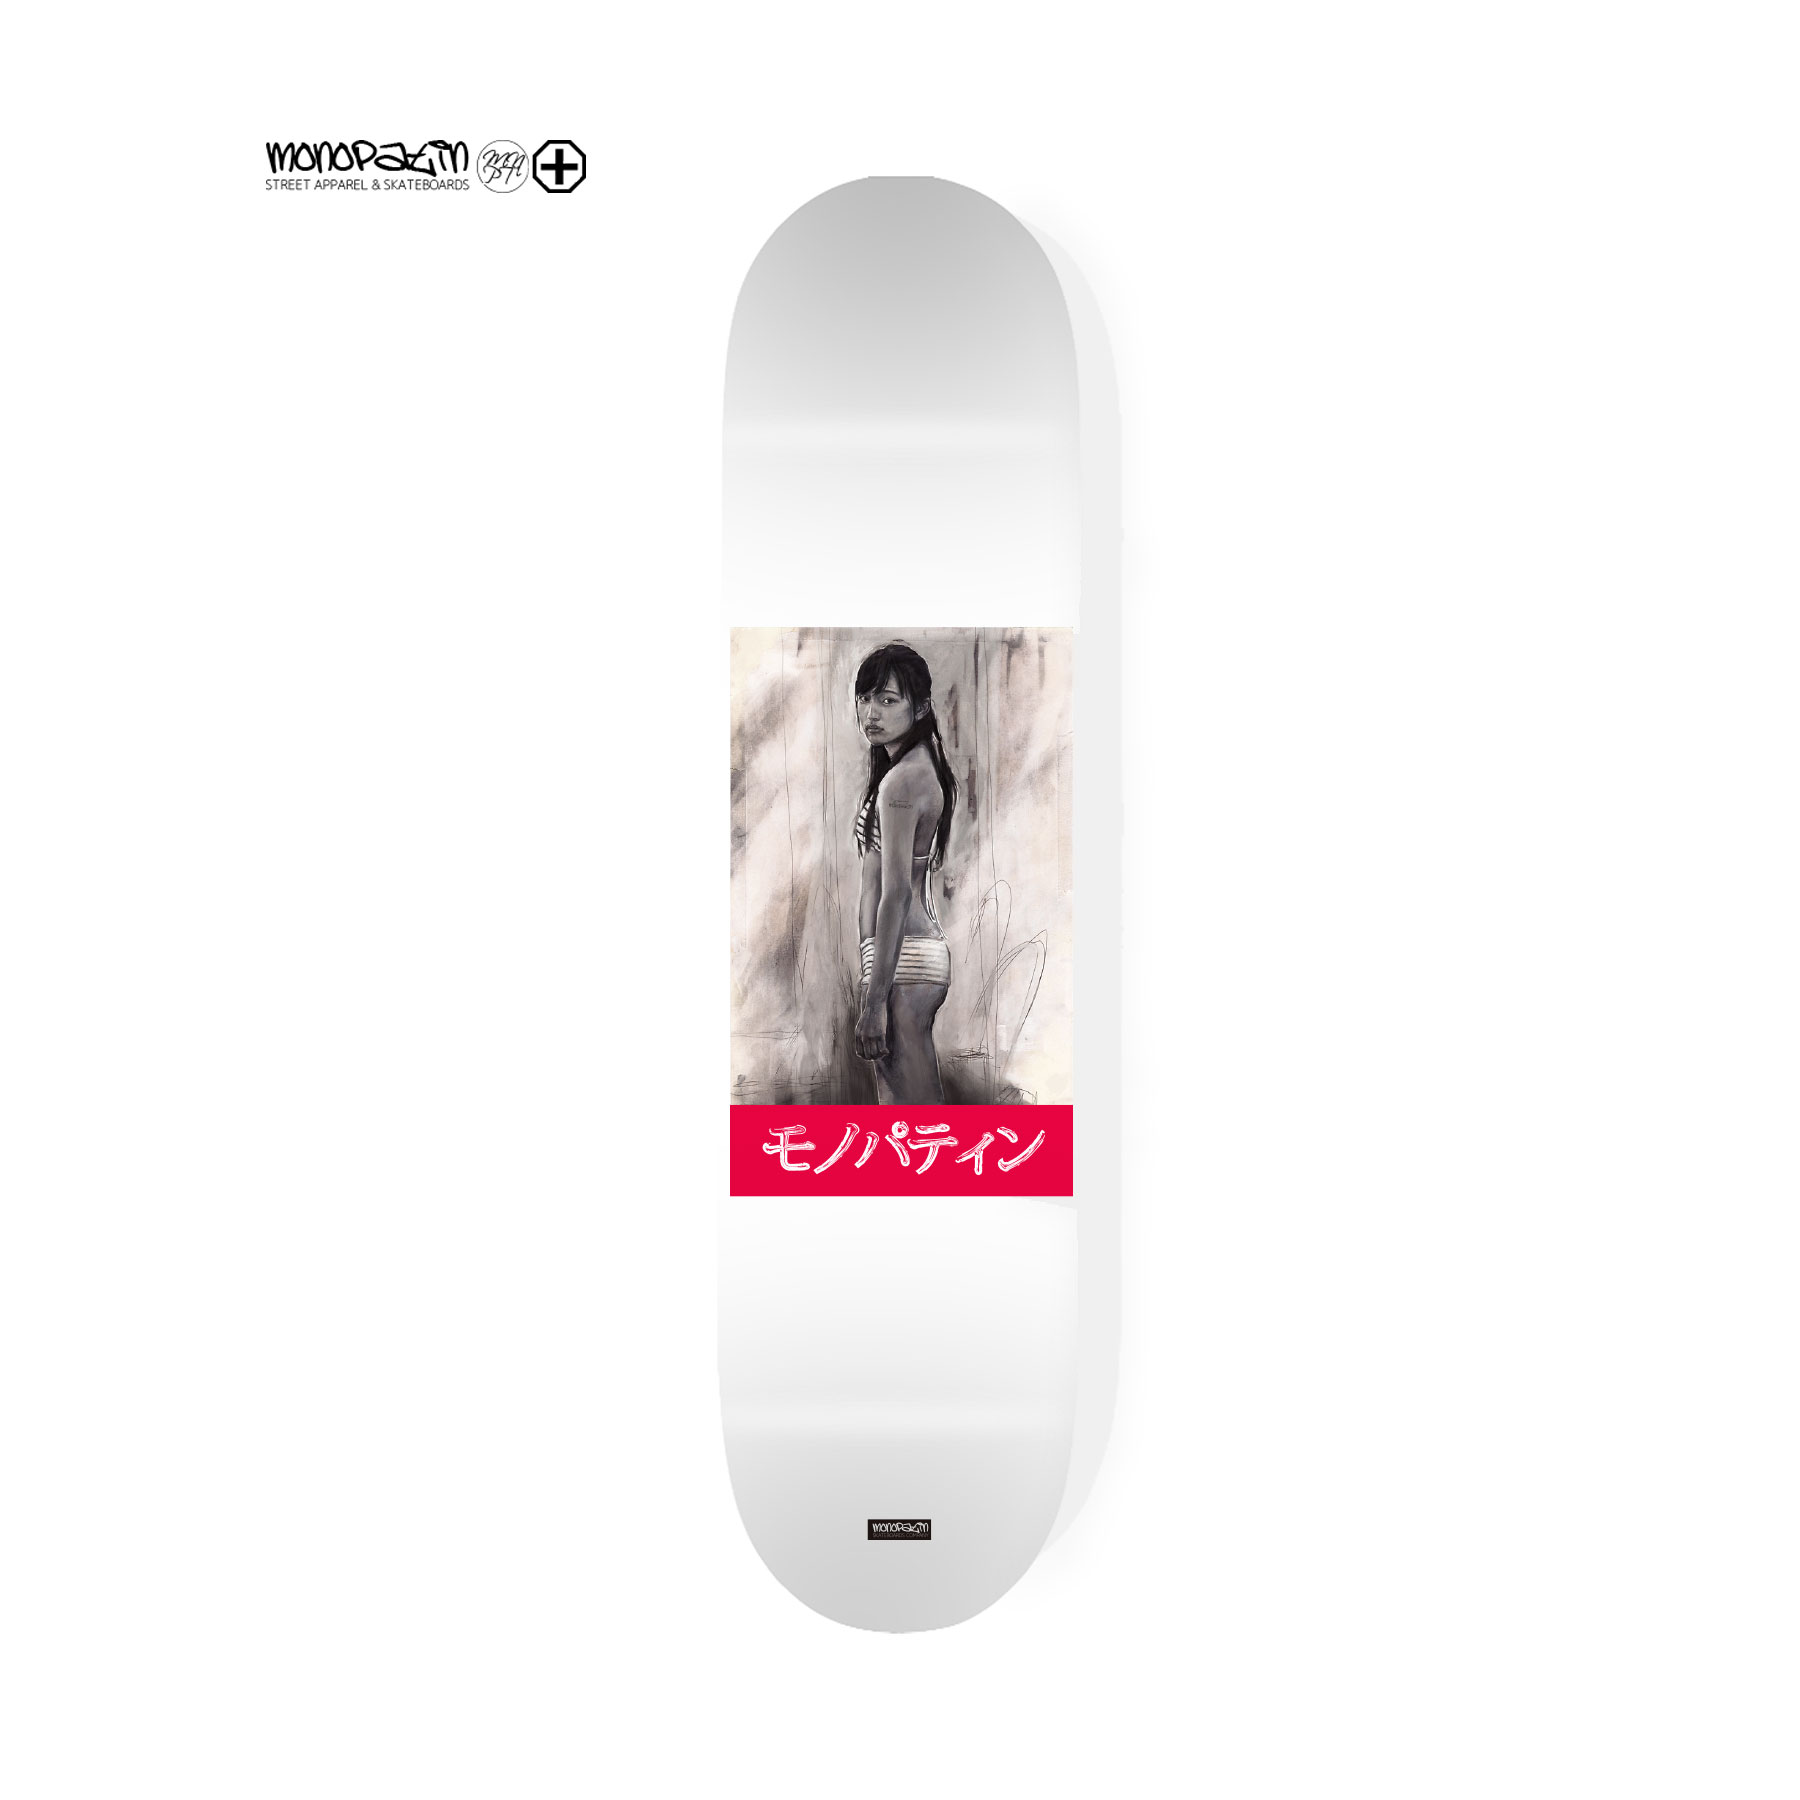 nippon girl 스케이트보드 데크